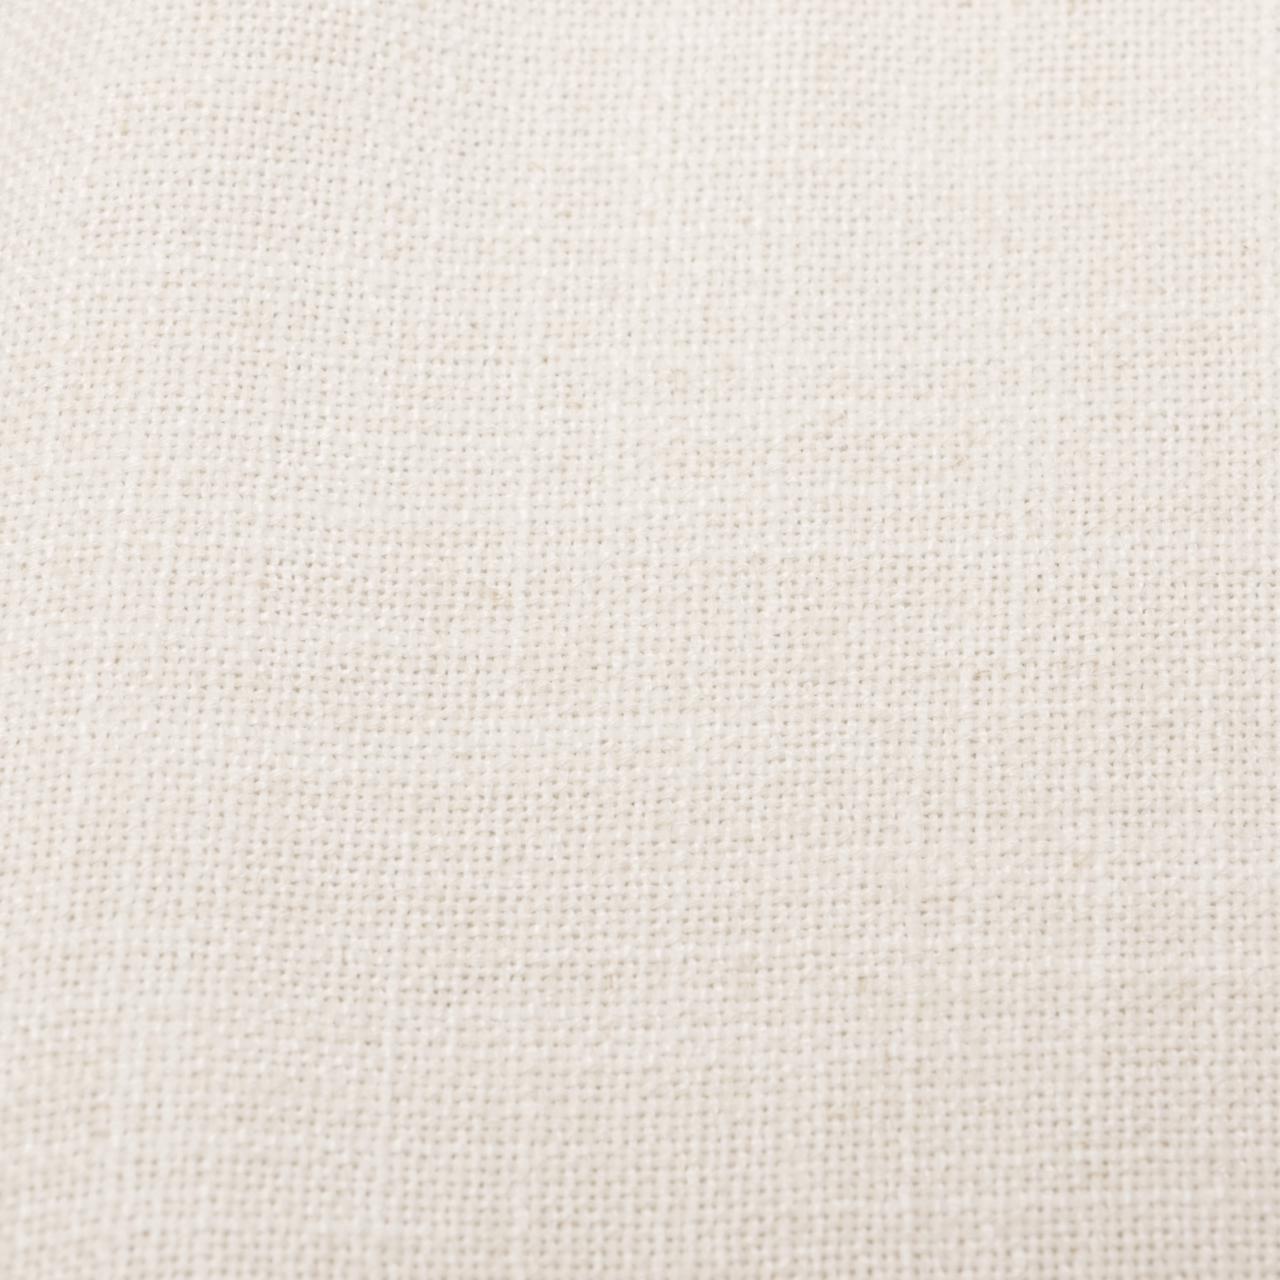 Emerson Bench in White